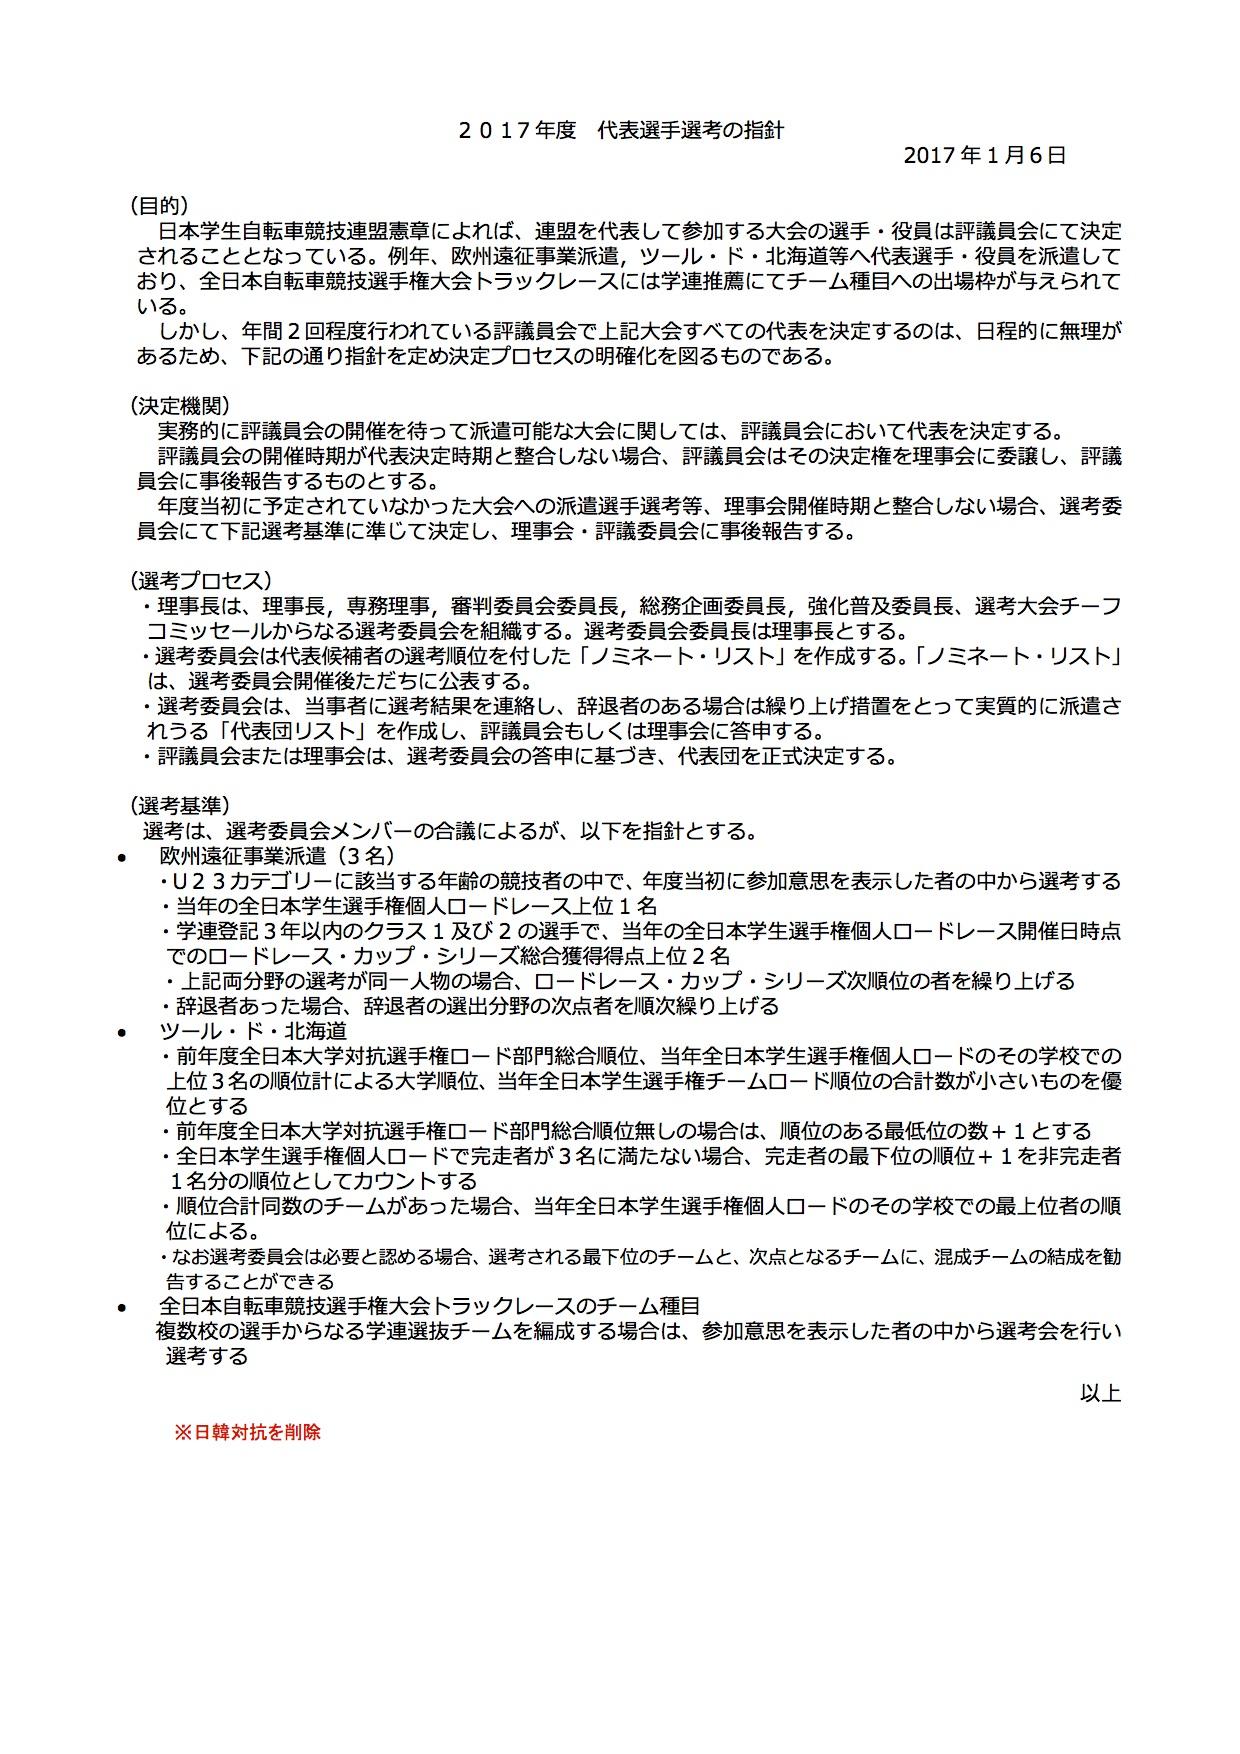 17sankakijyun_daihyoshisin170111_05